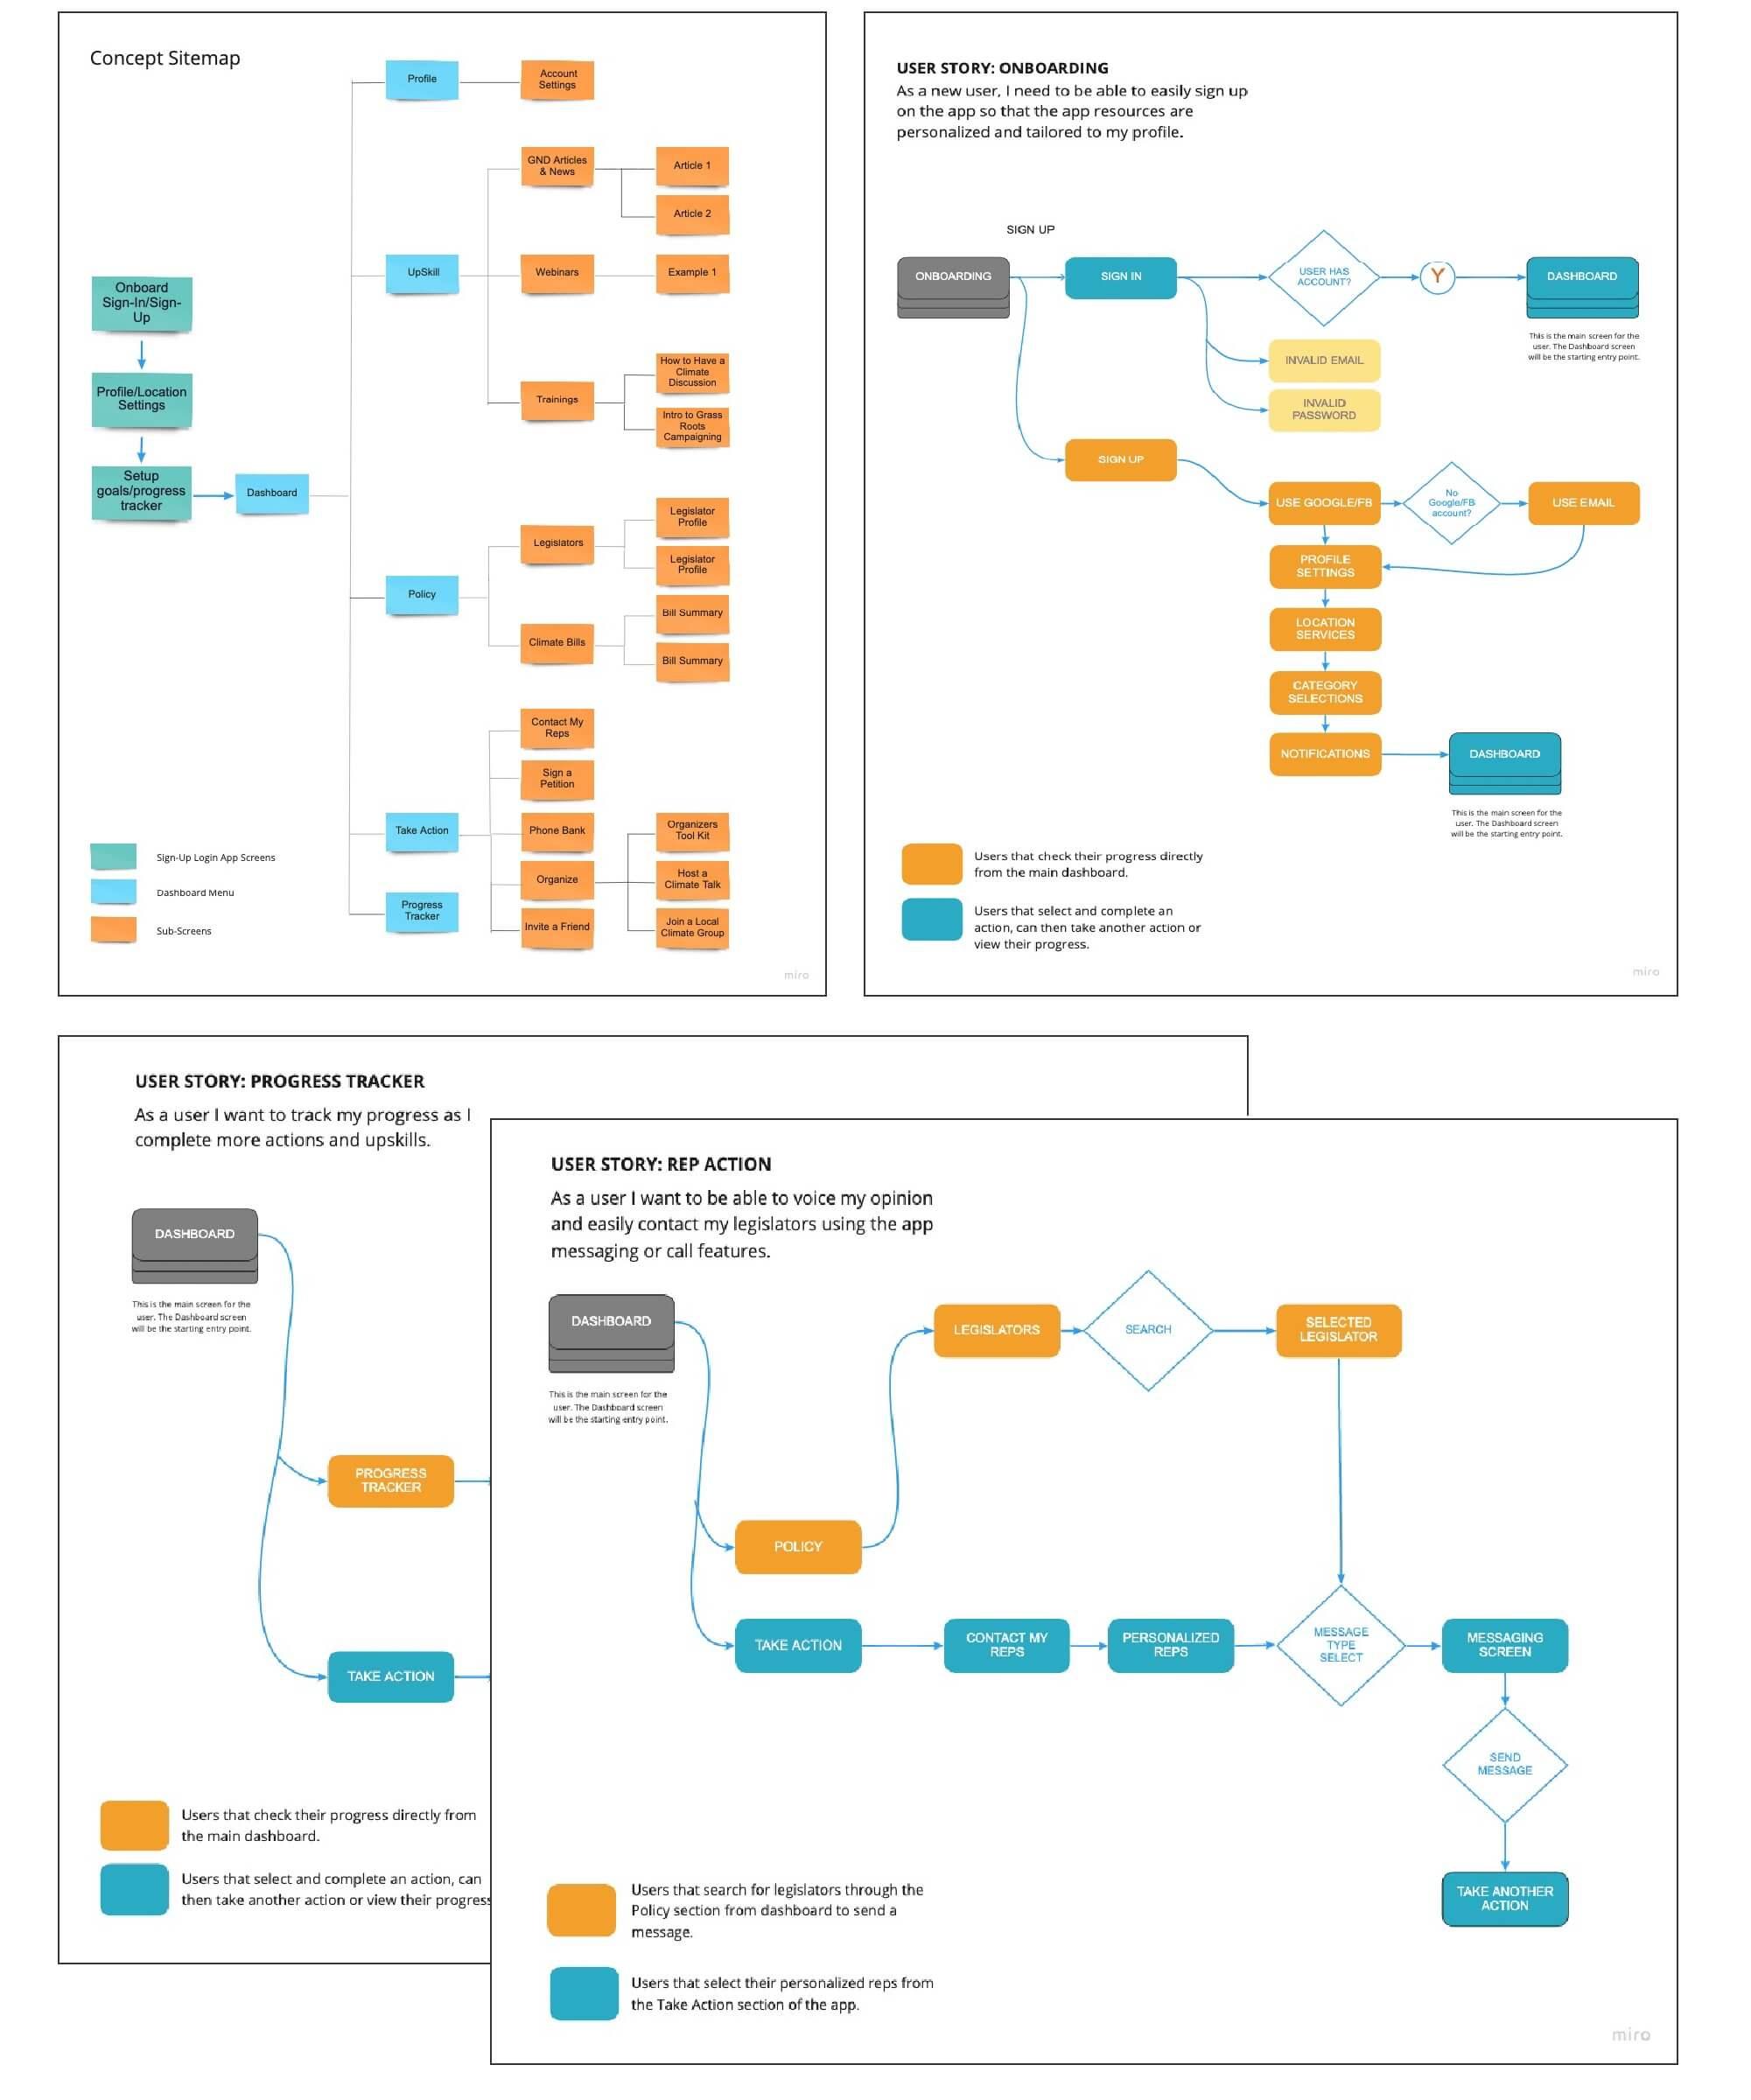 image of userflow charts